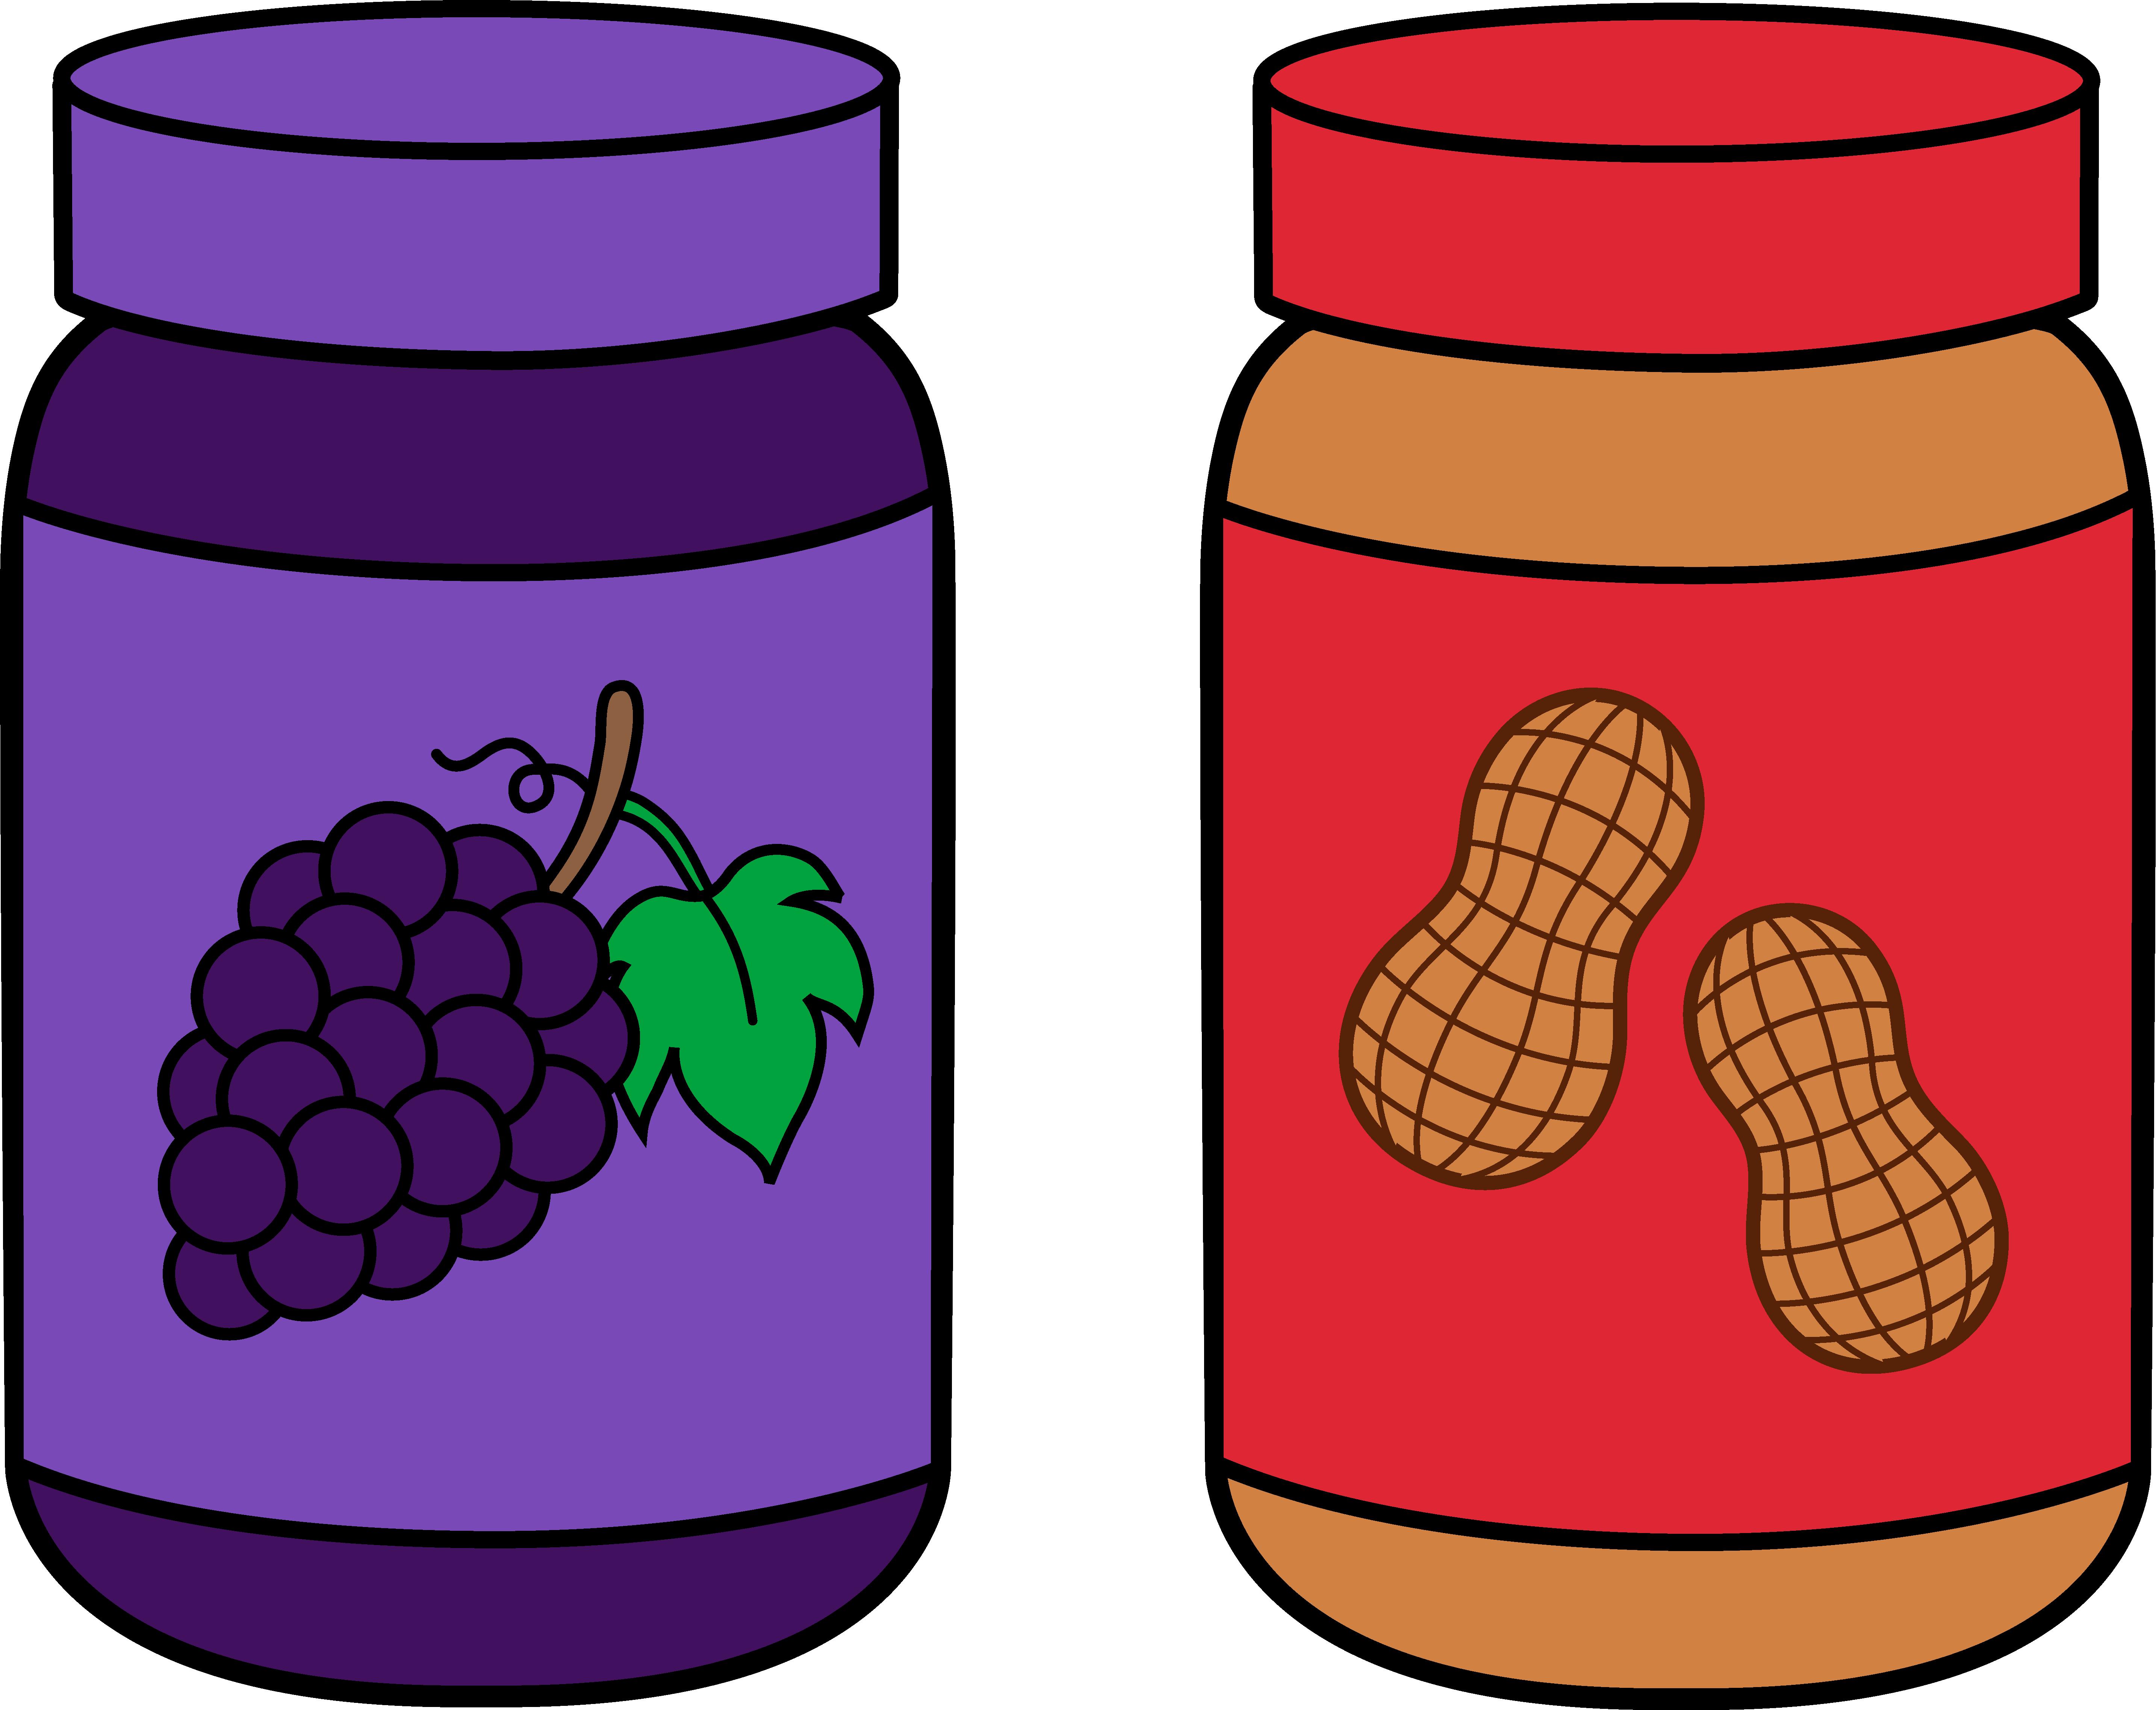 Peanut butter . Marbles clipart jar clipart